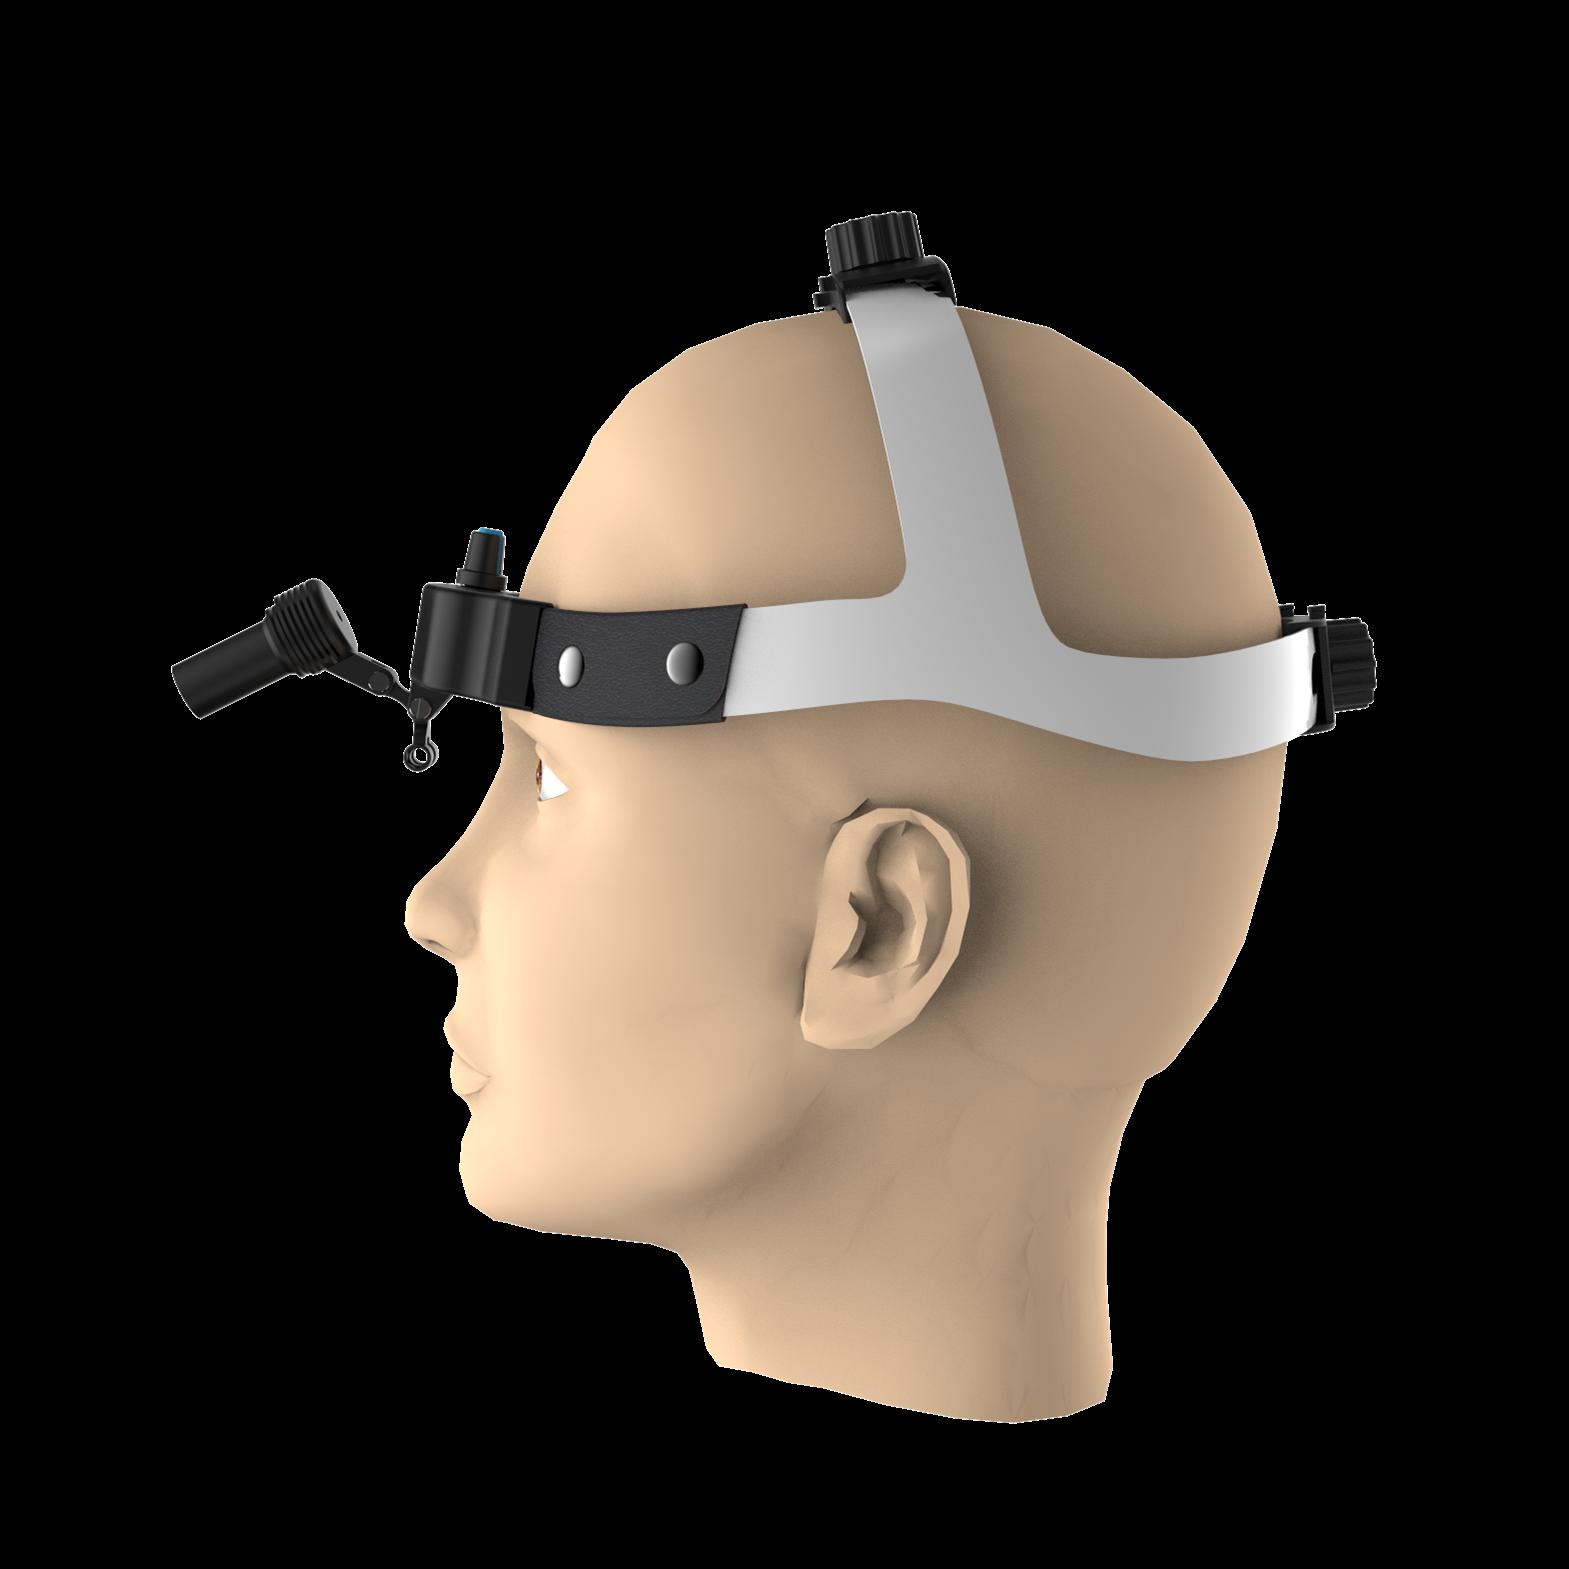 Best Seller 3W Wireless LED Headlight For Dental Or Surgical (TD-M02B-F) enlarge